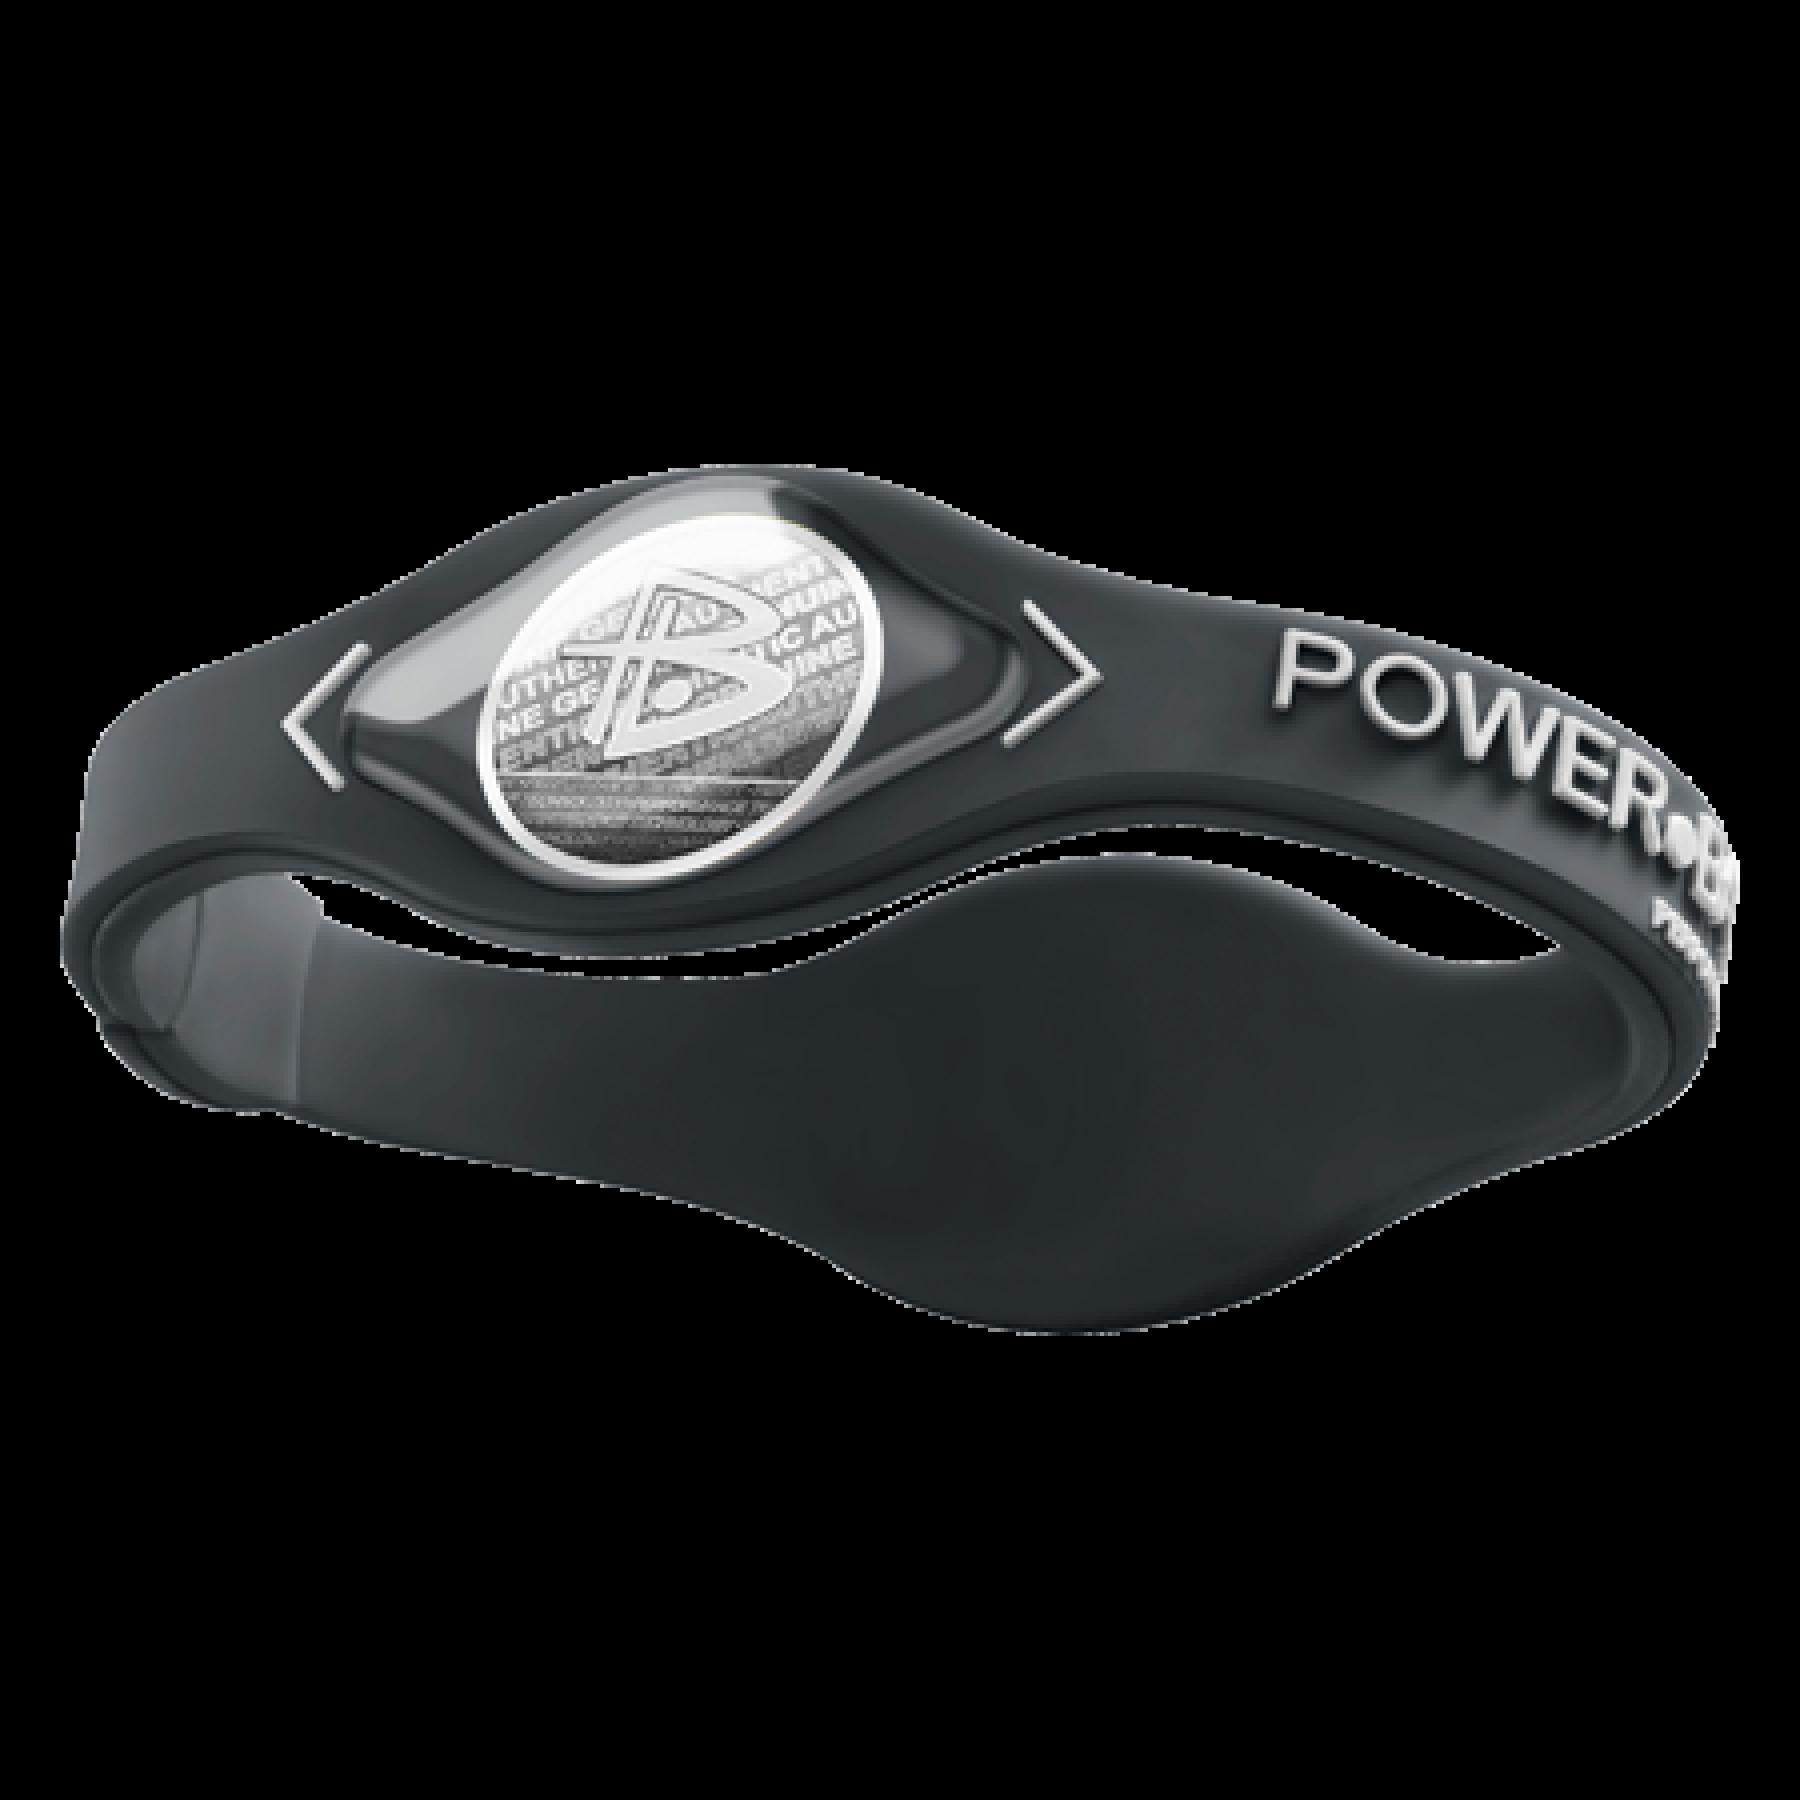 Браслет Power Balance  серия Core Black/White